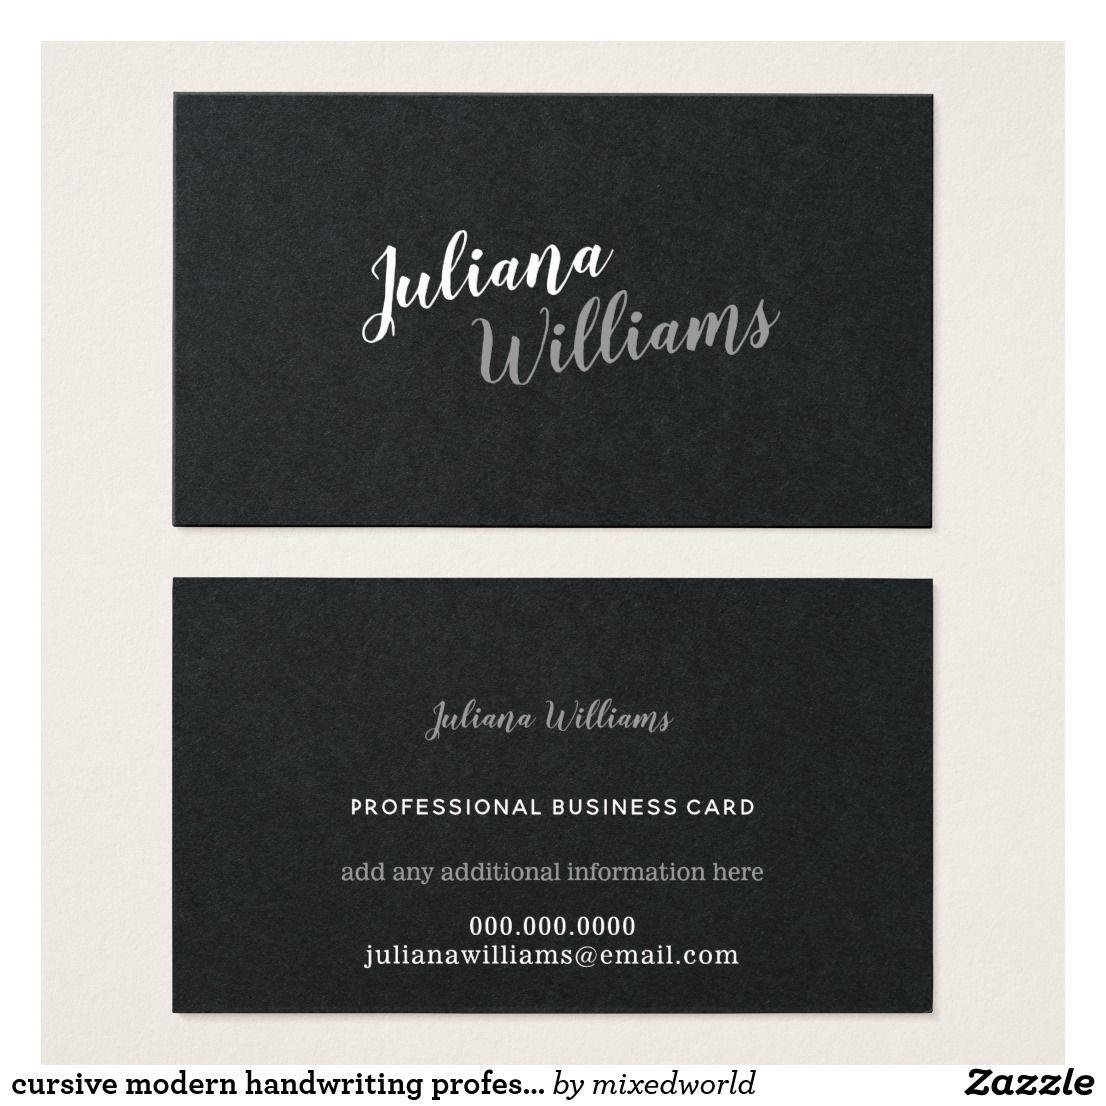 cursive modern handwriting professional black business